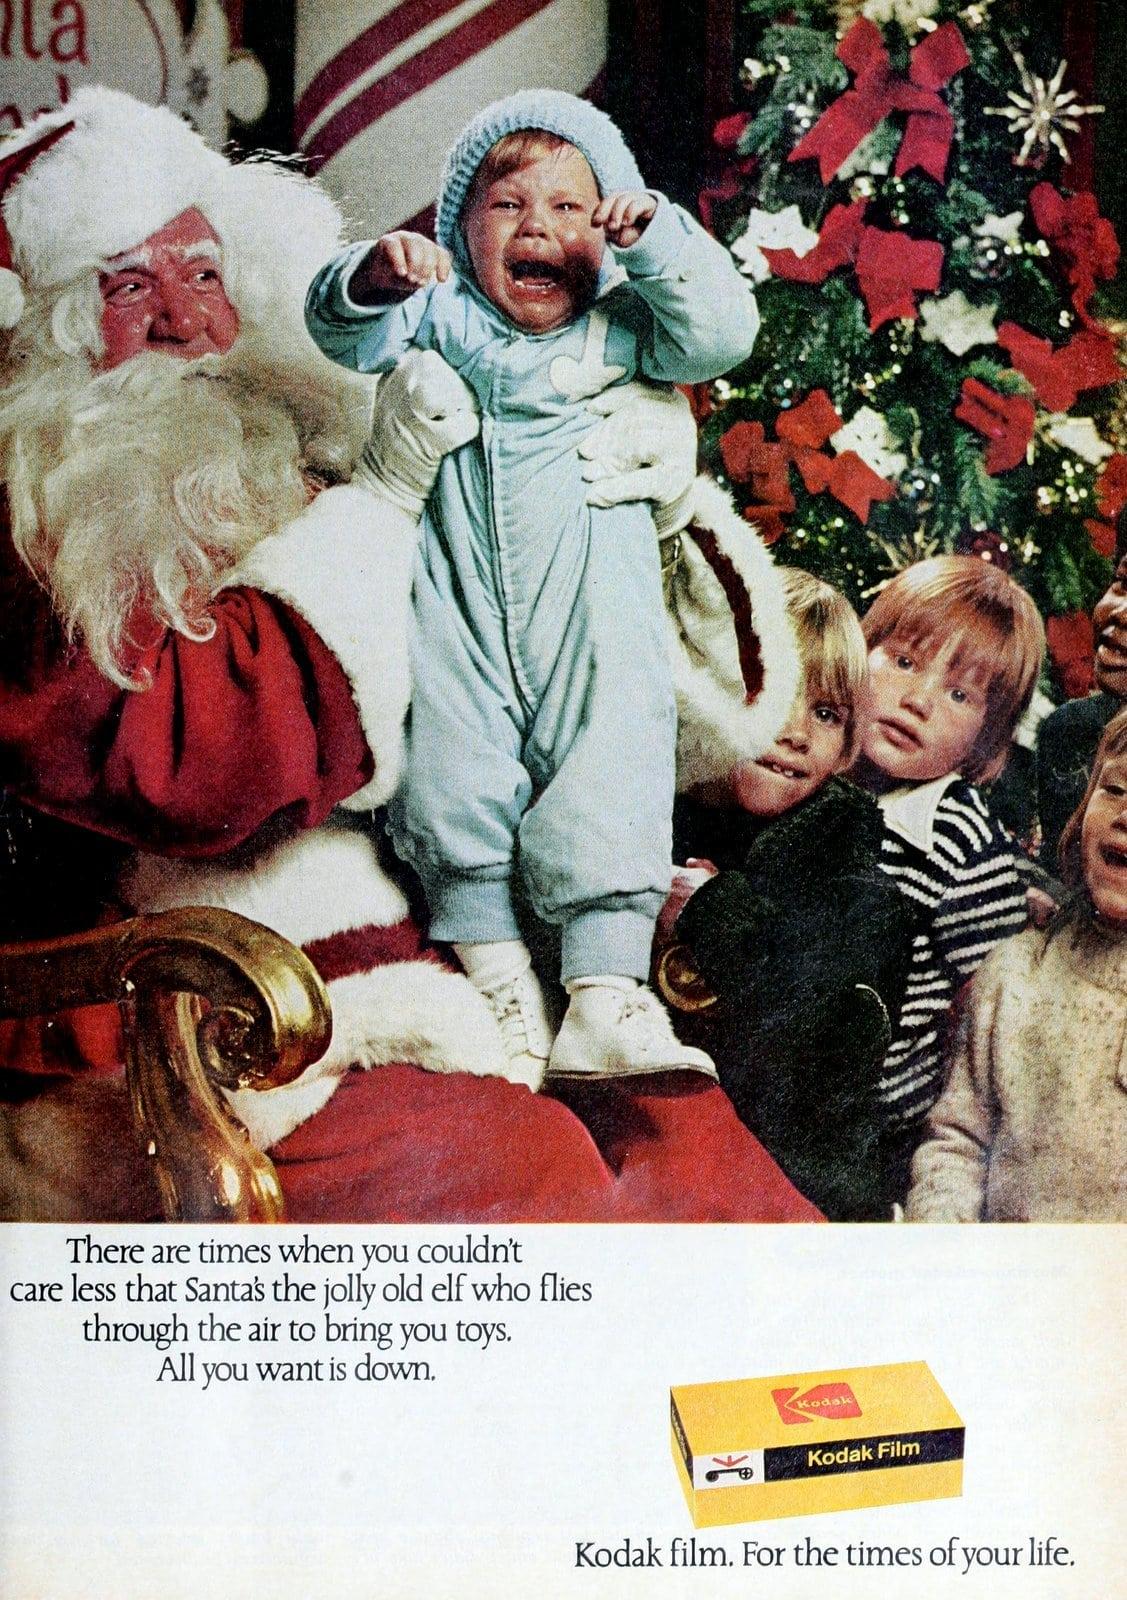 Screaming toddler with Santa around 1974 - Kodak ad